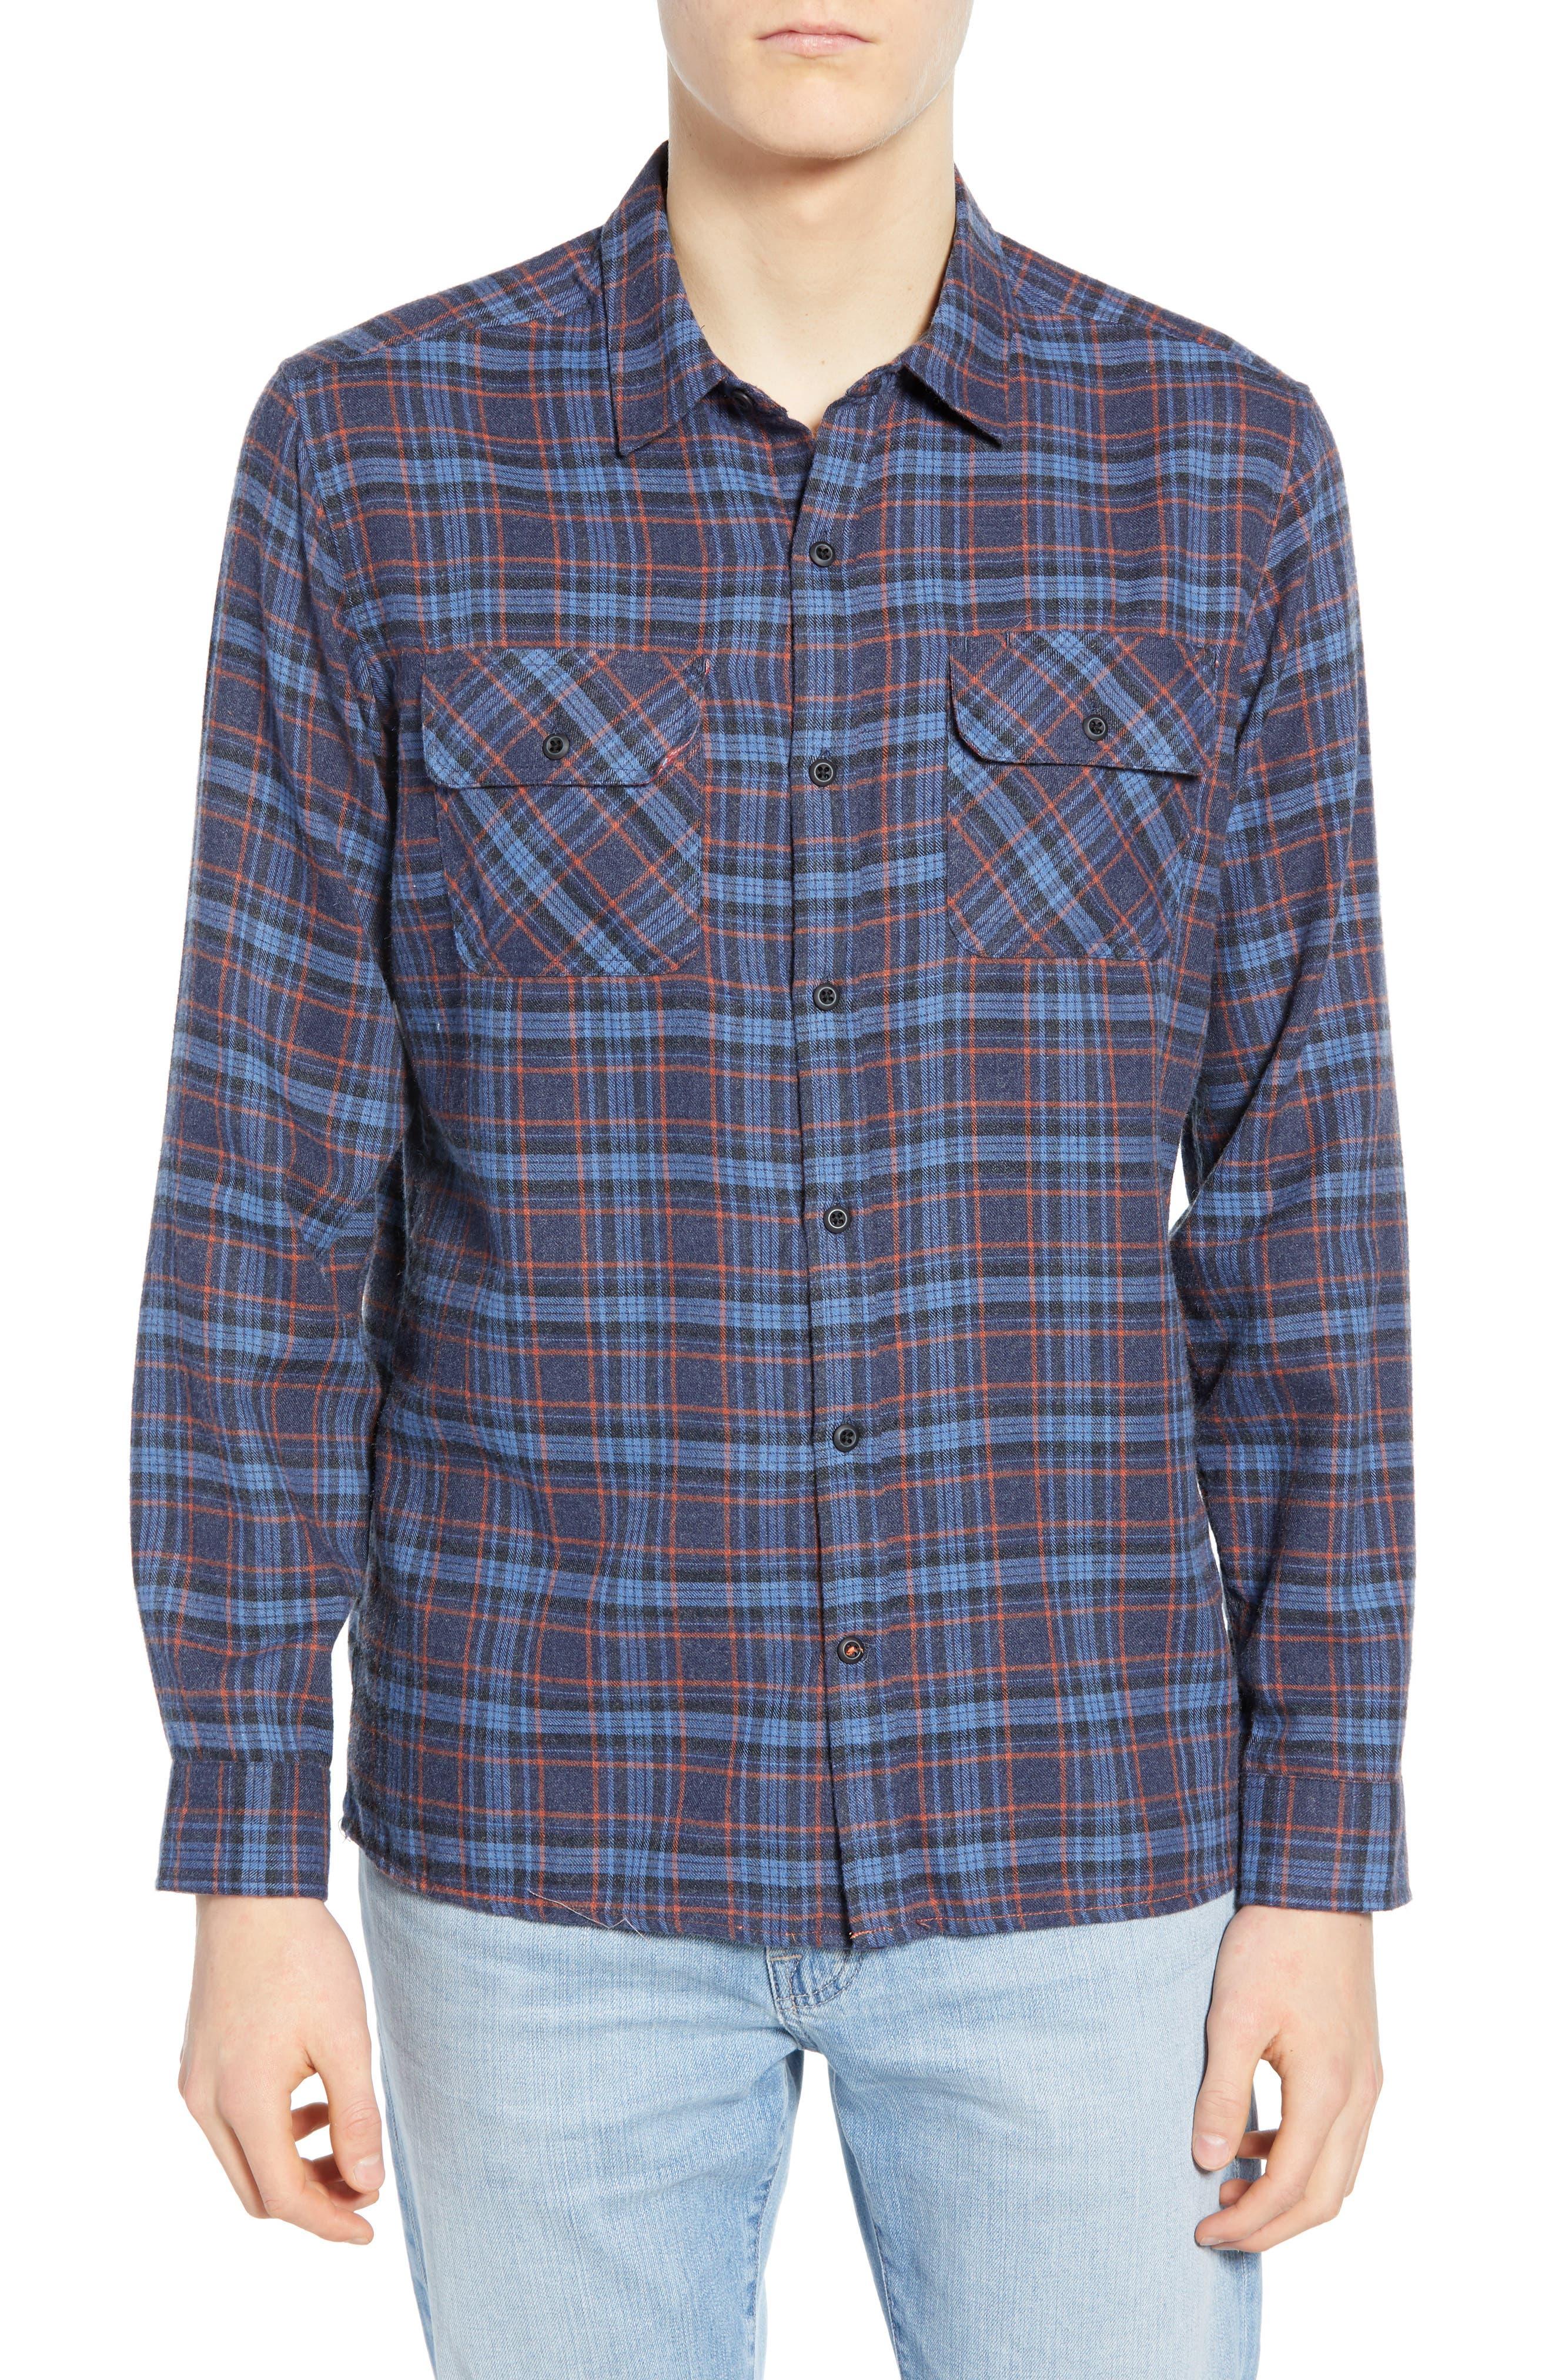 Walker Plaid Flannel Shirt,                             Main thumbnail 1, color,                             OIL GREY